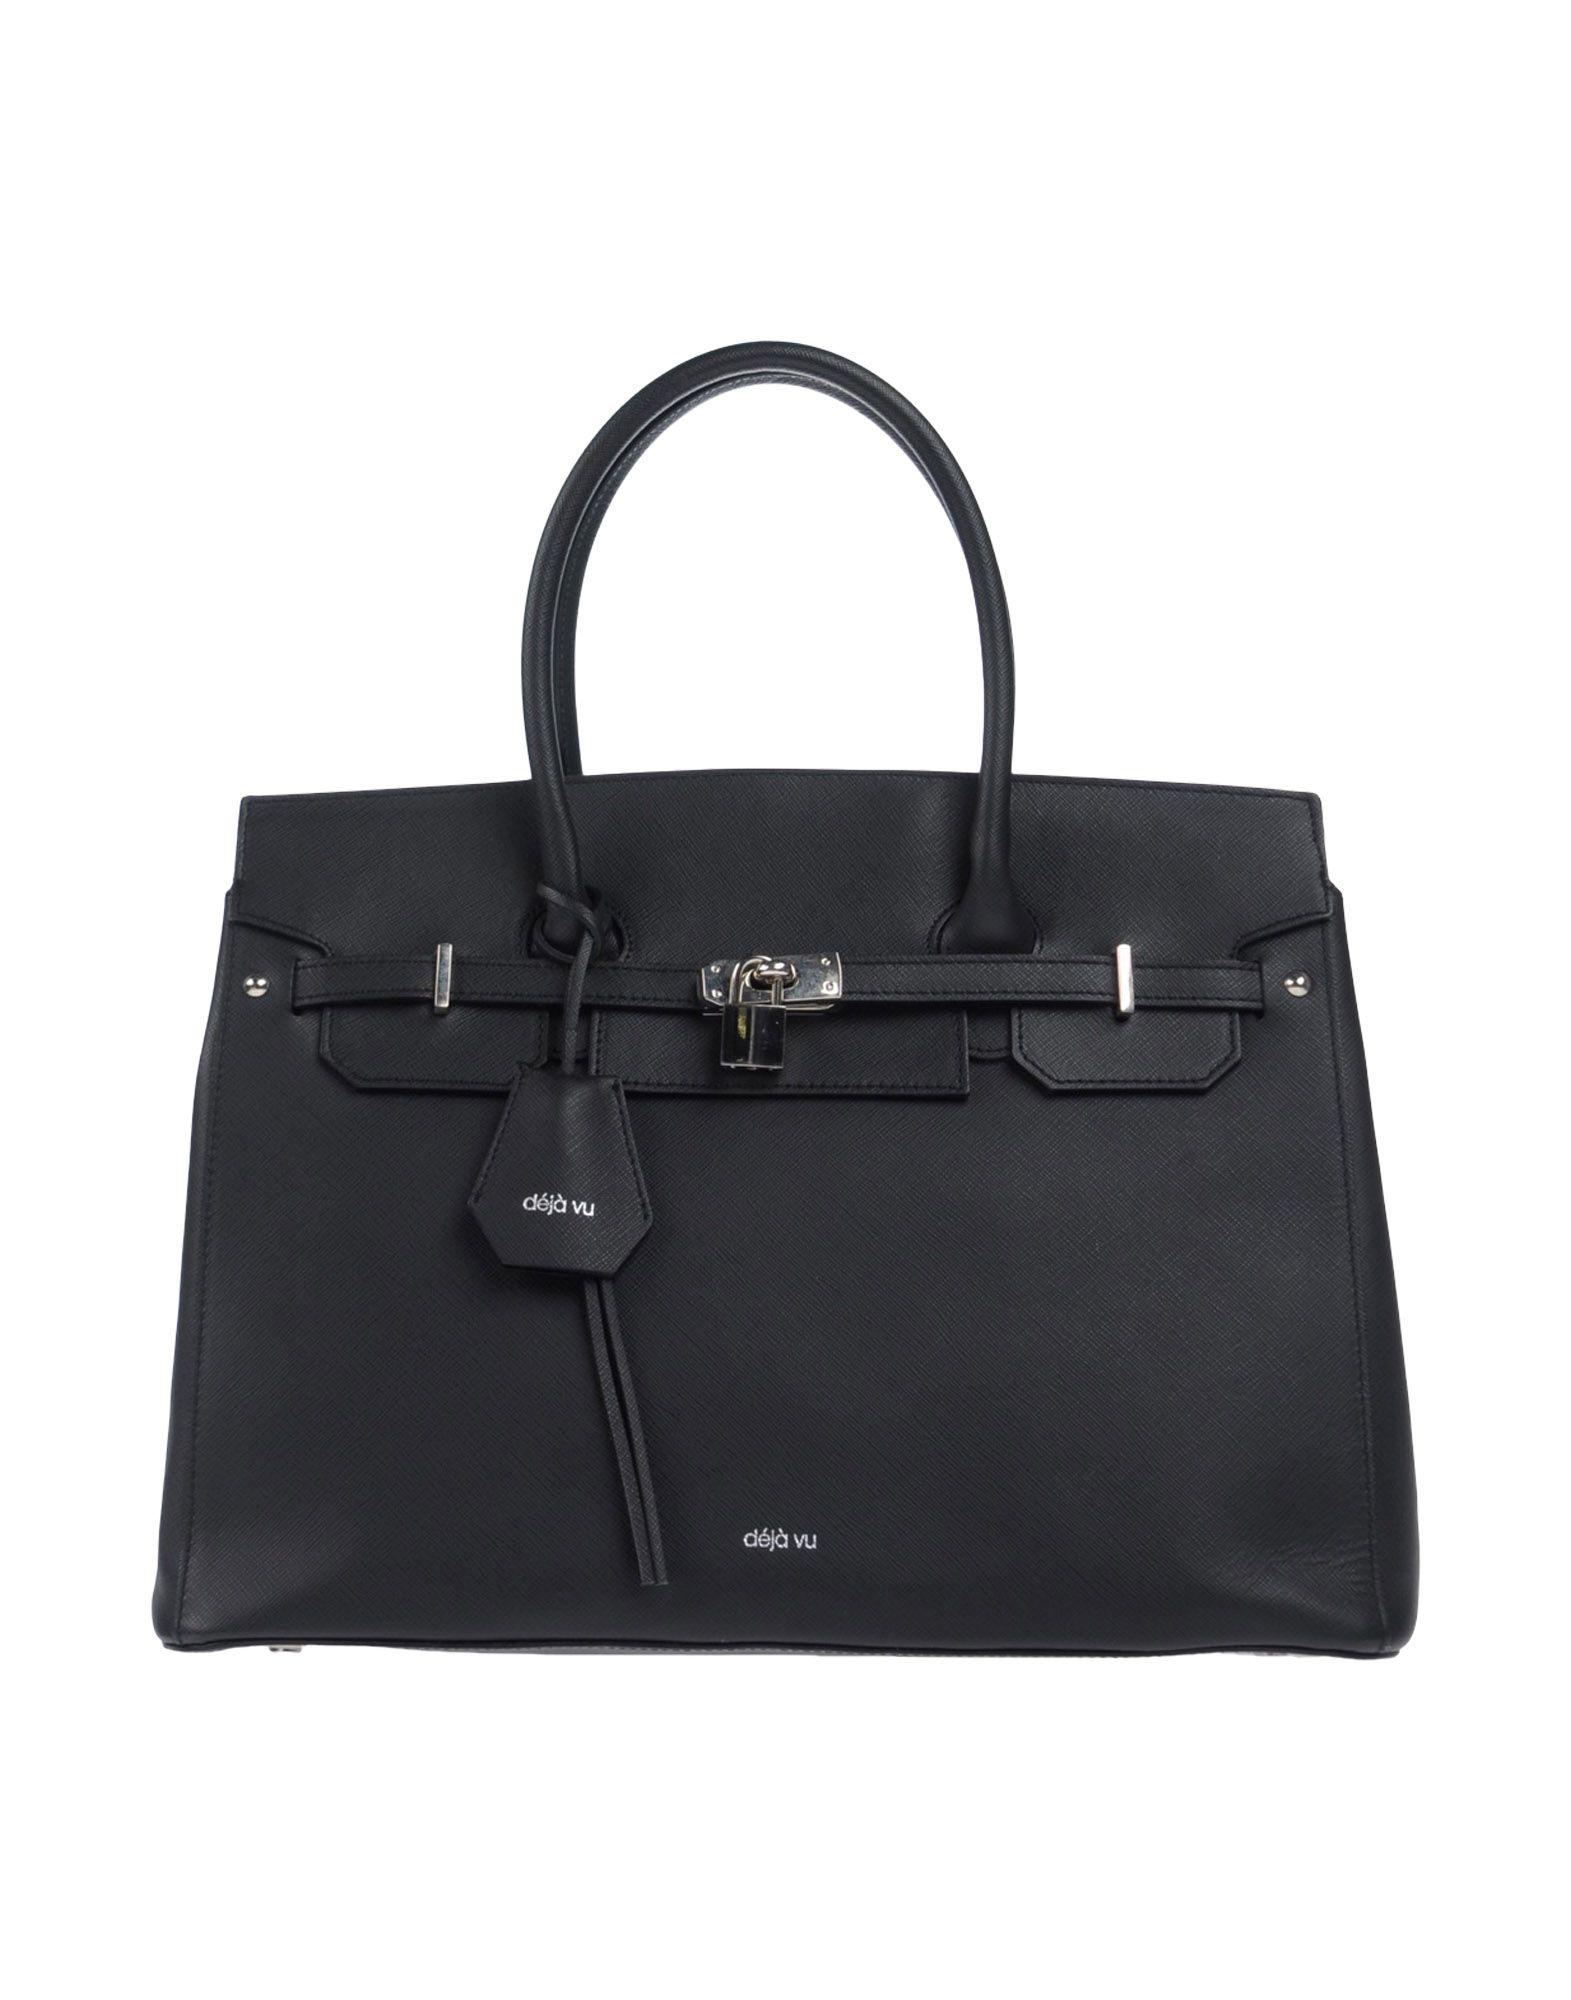 Déjà vu Handbag in Multicolor (Black)